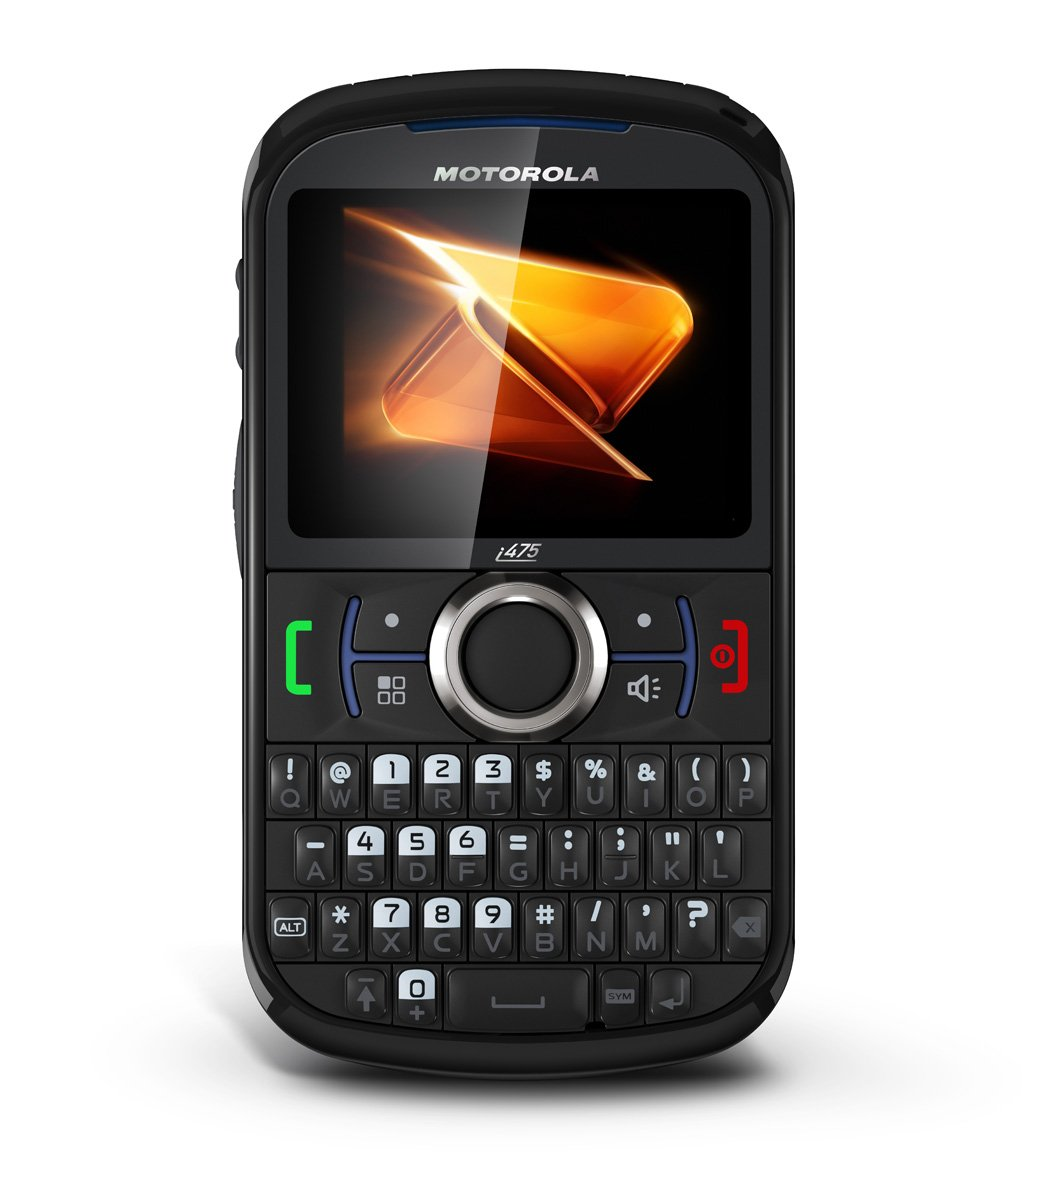 Motorola-Clutch-i475-Prepaid-Phone-Boost-Mobile-